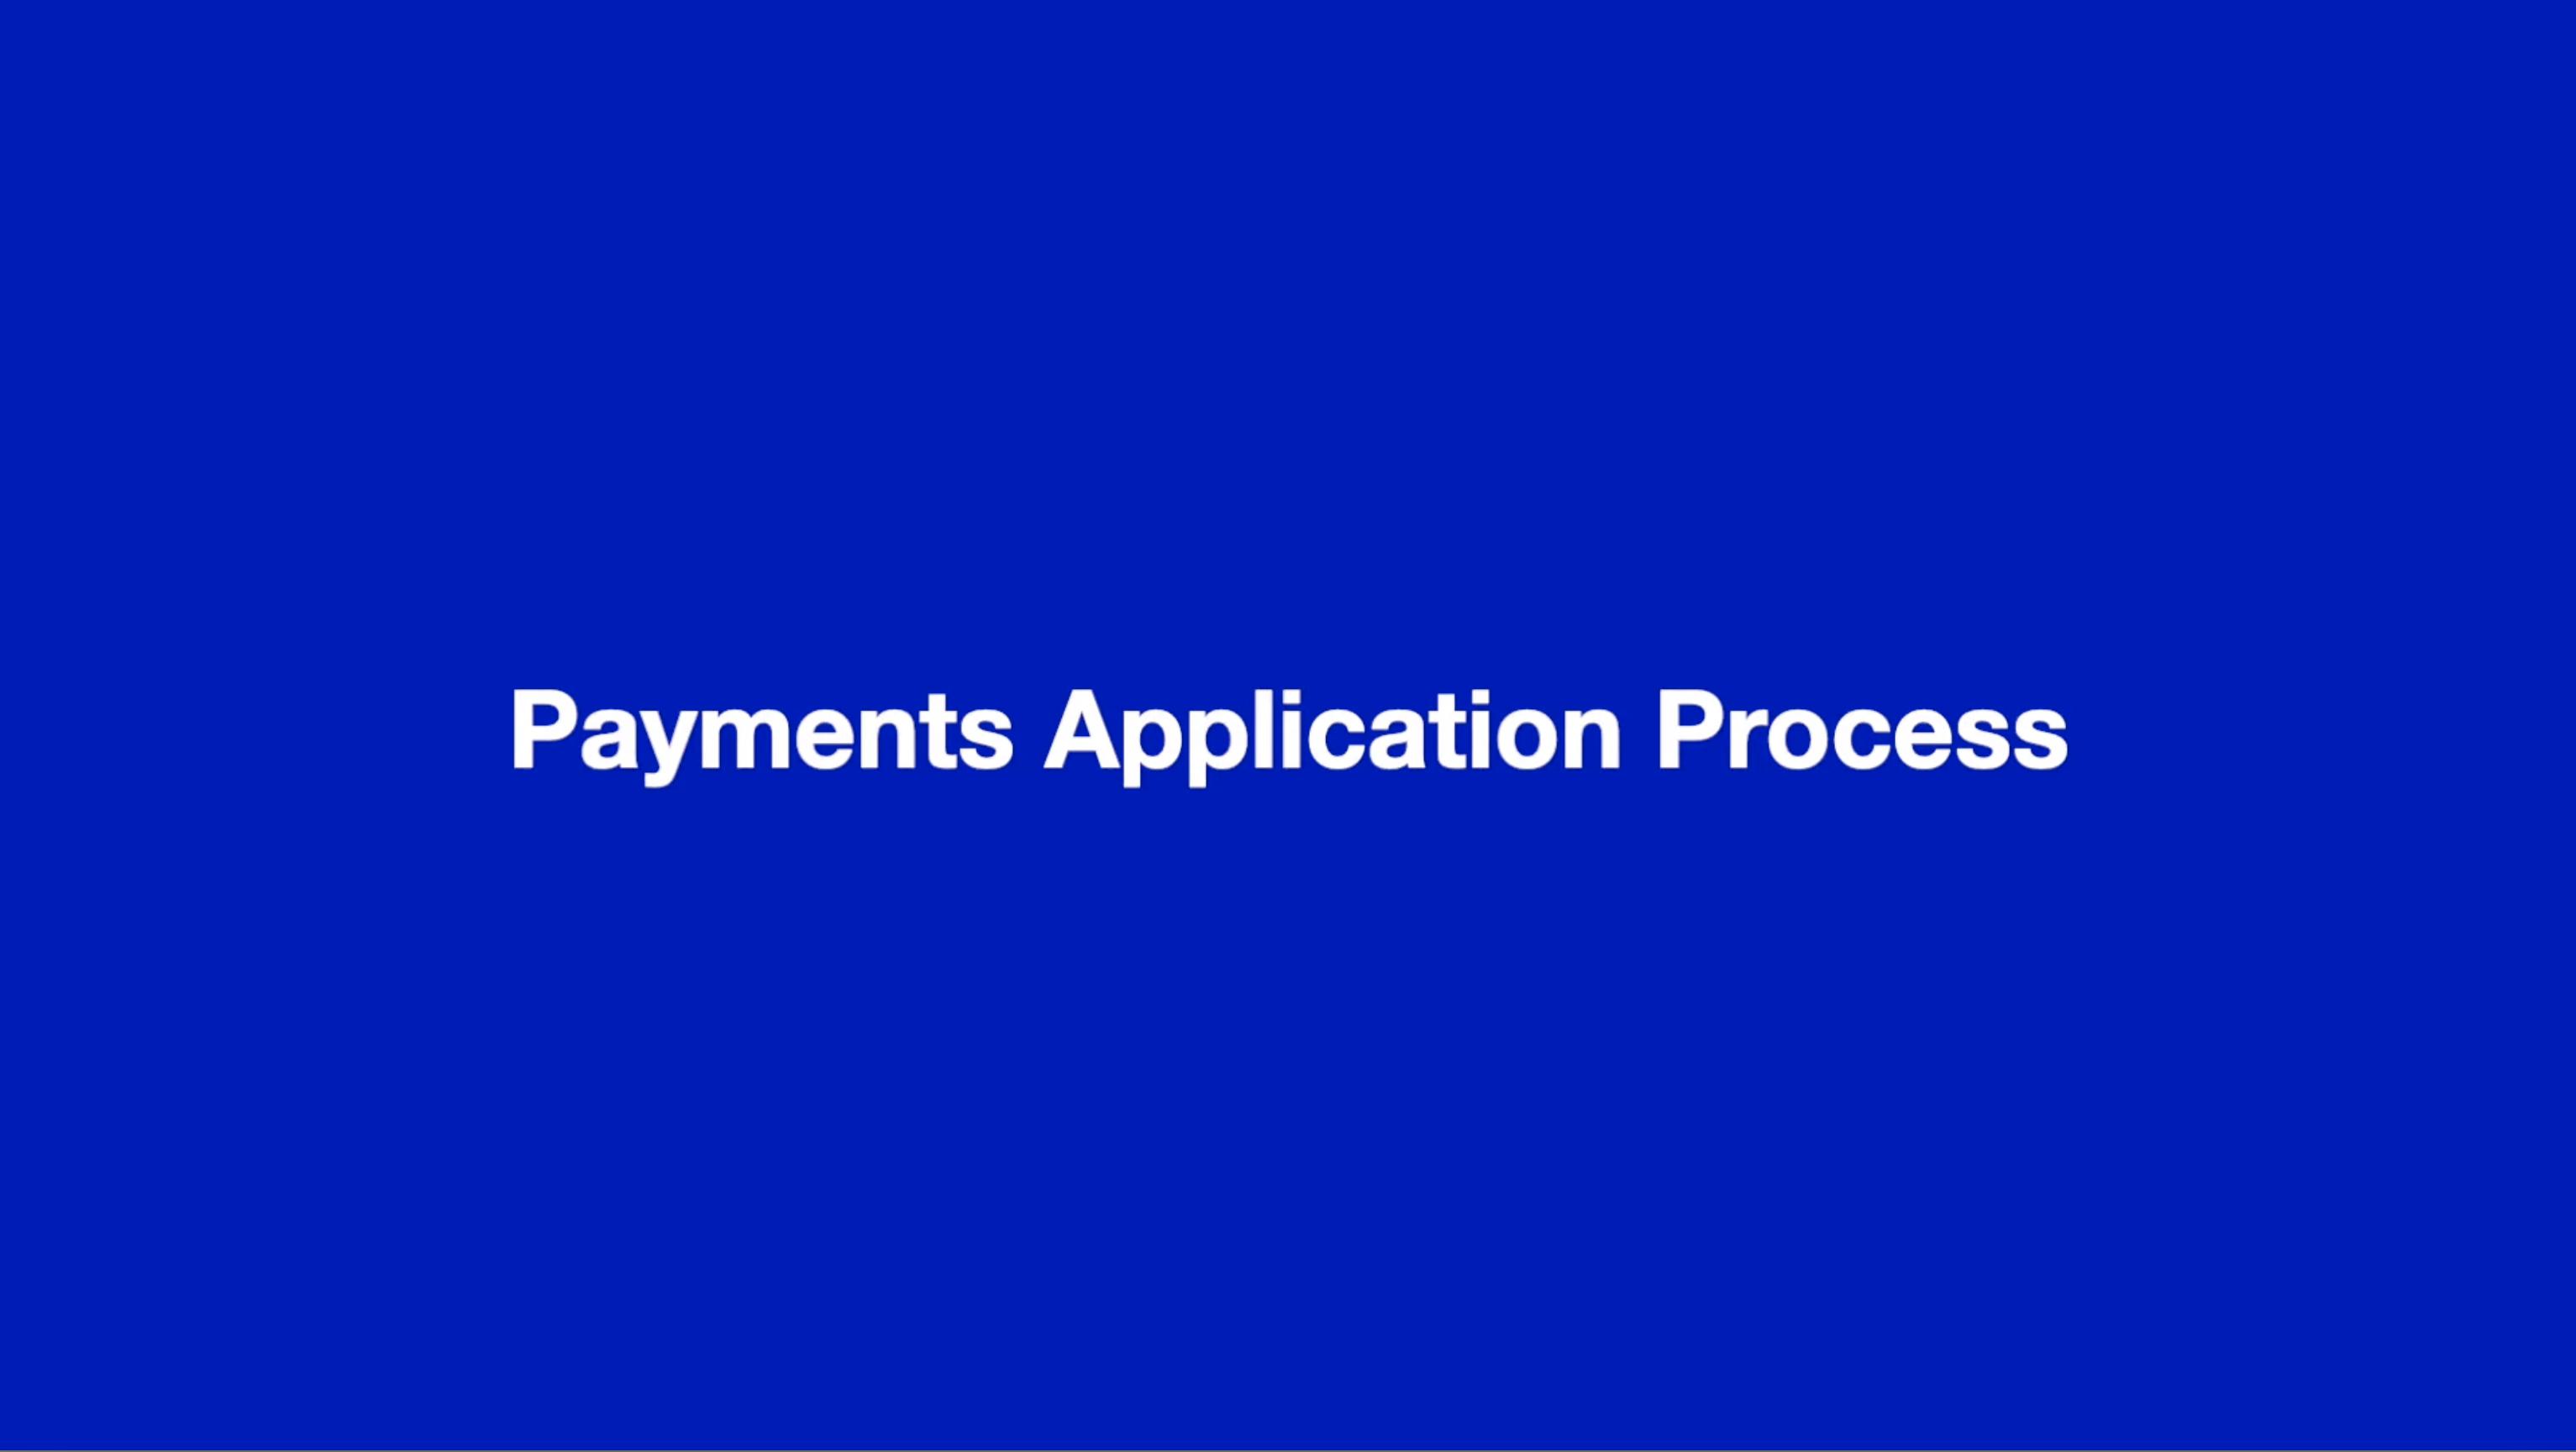 Payments Application Process thumbnail